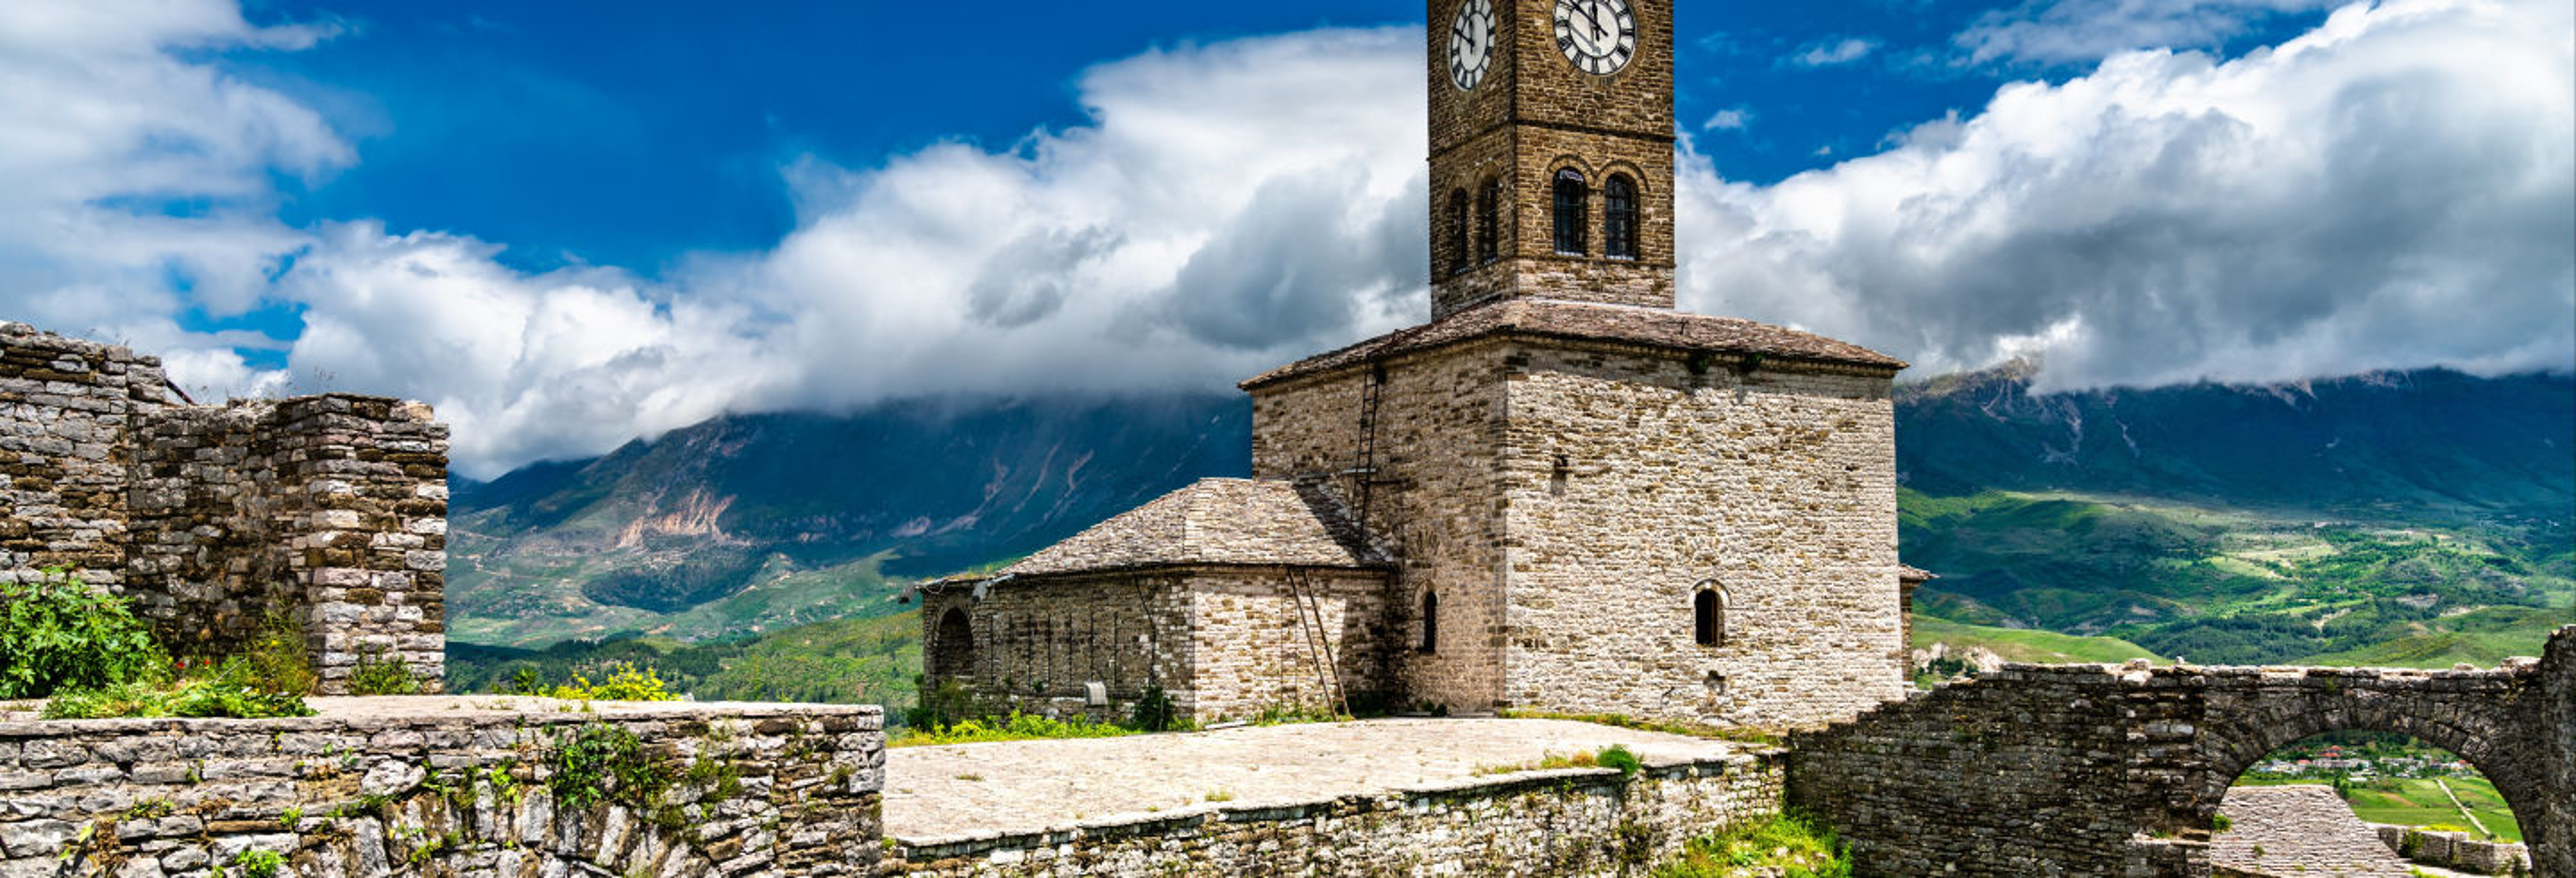 Excursion à Gjirokastër